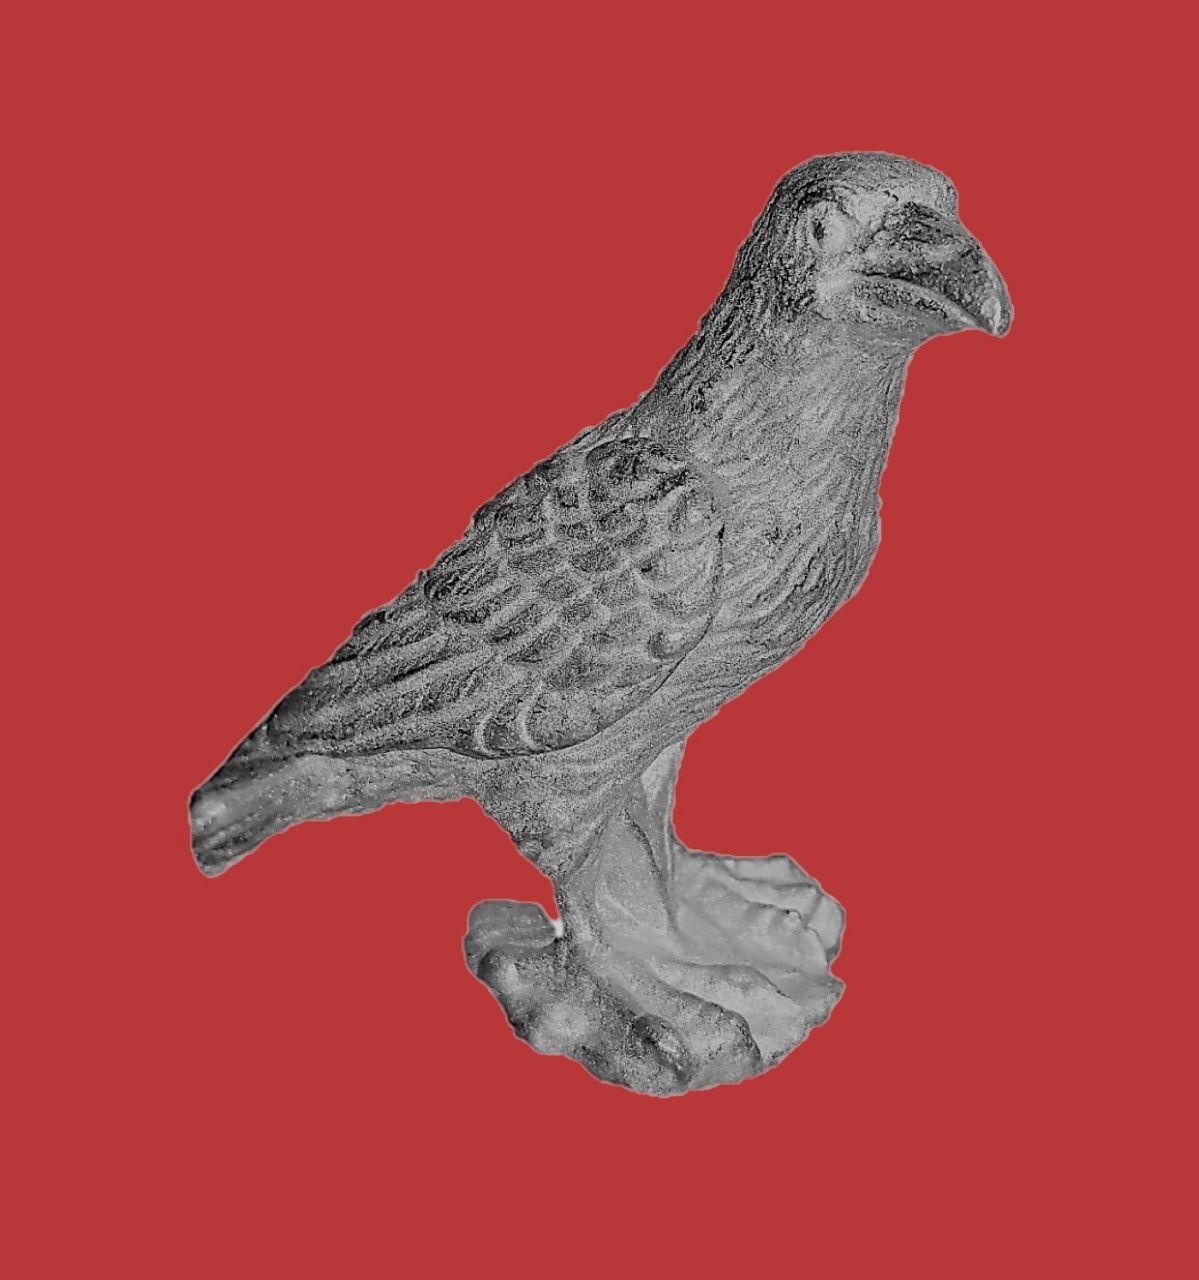 Zinngießform Greifvogel Raabe, ca. 138g Reinzinn